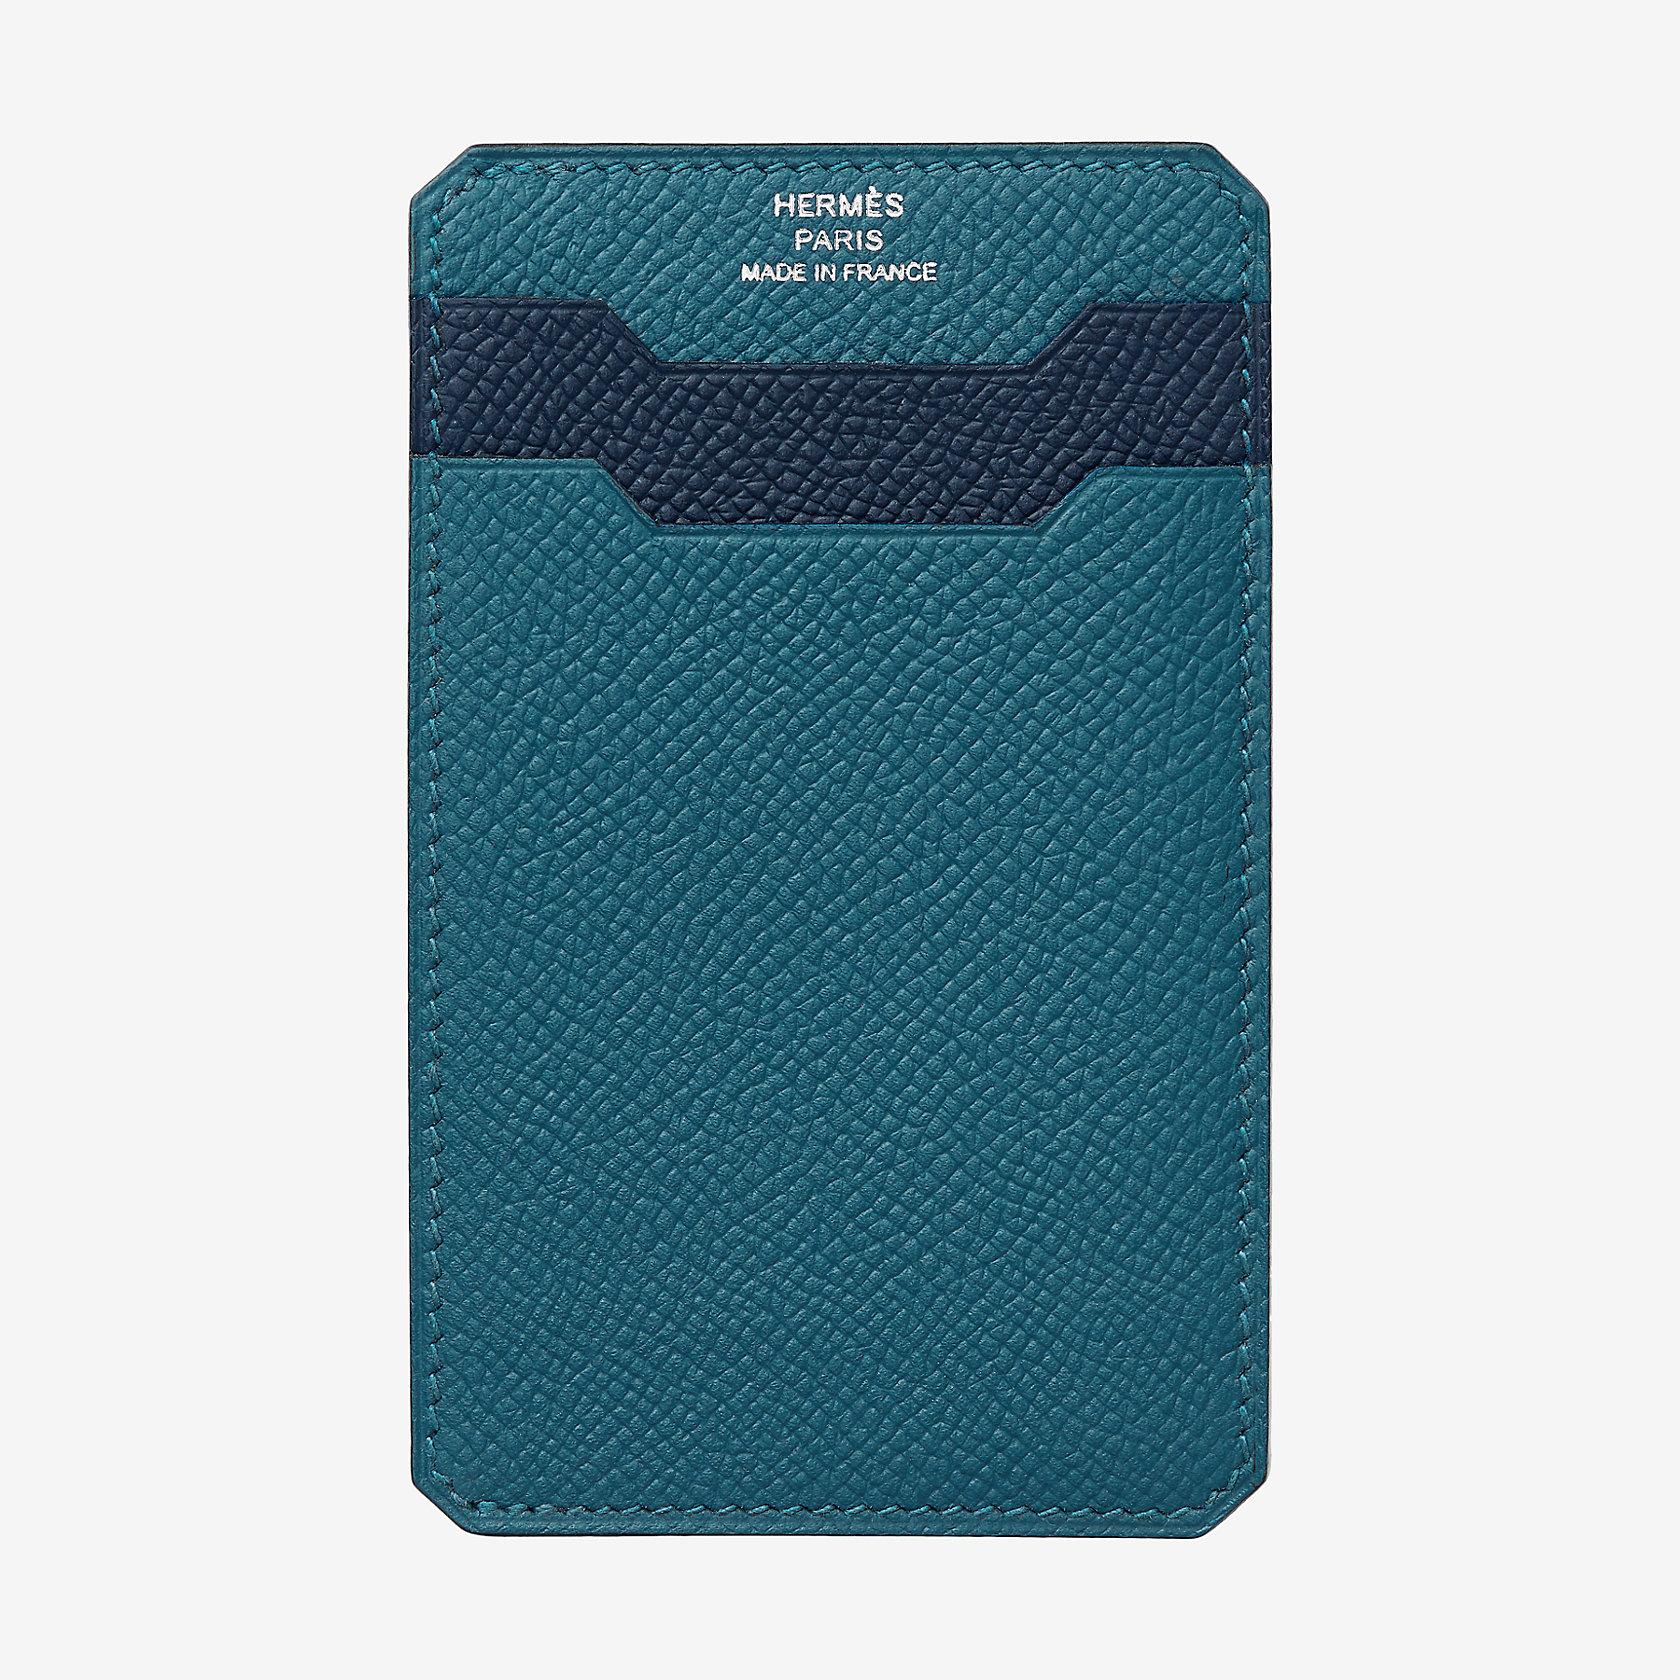 City 3cc jungle card holder small model herms colourmoves